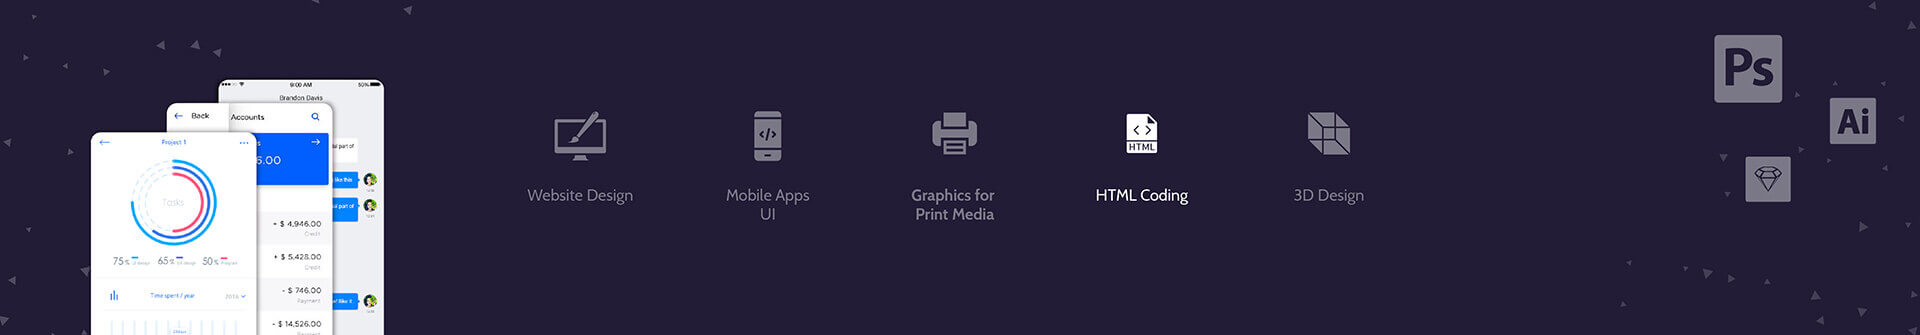 PSD to HTML 5 Development